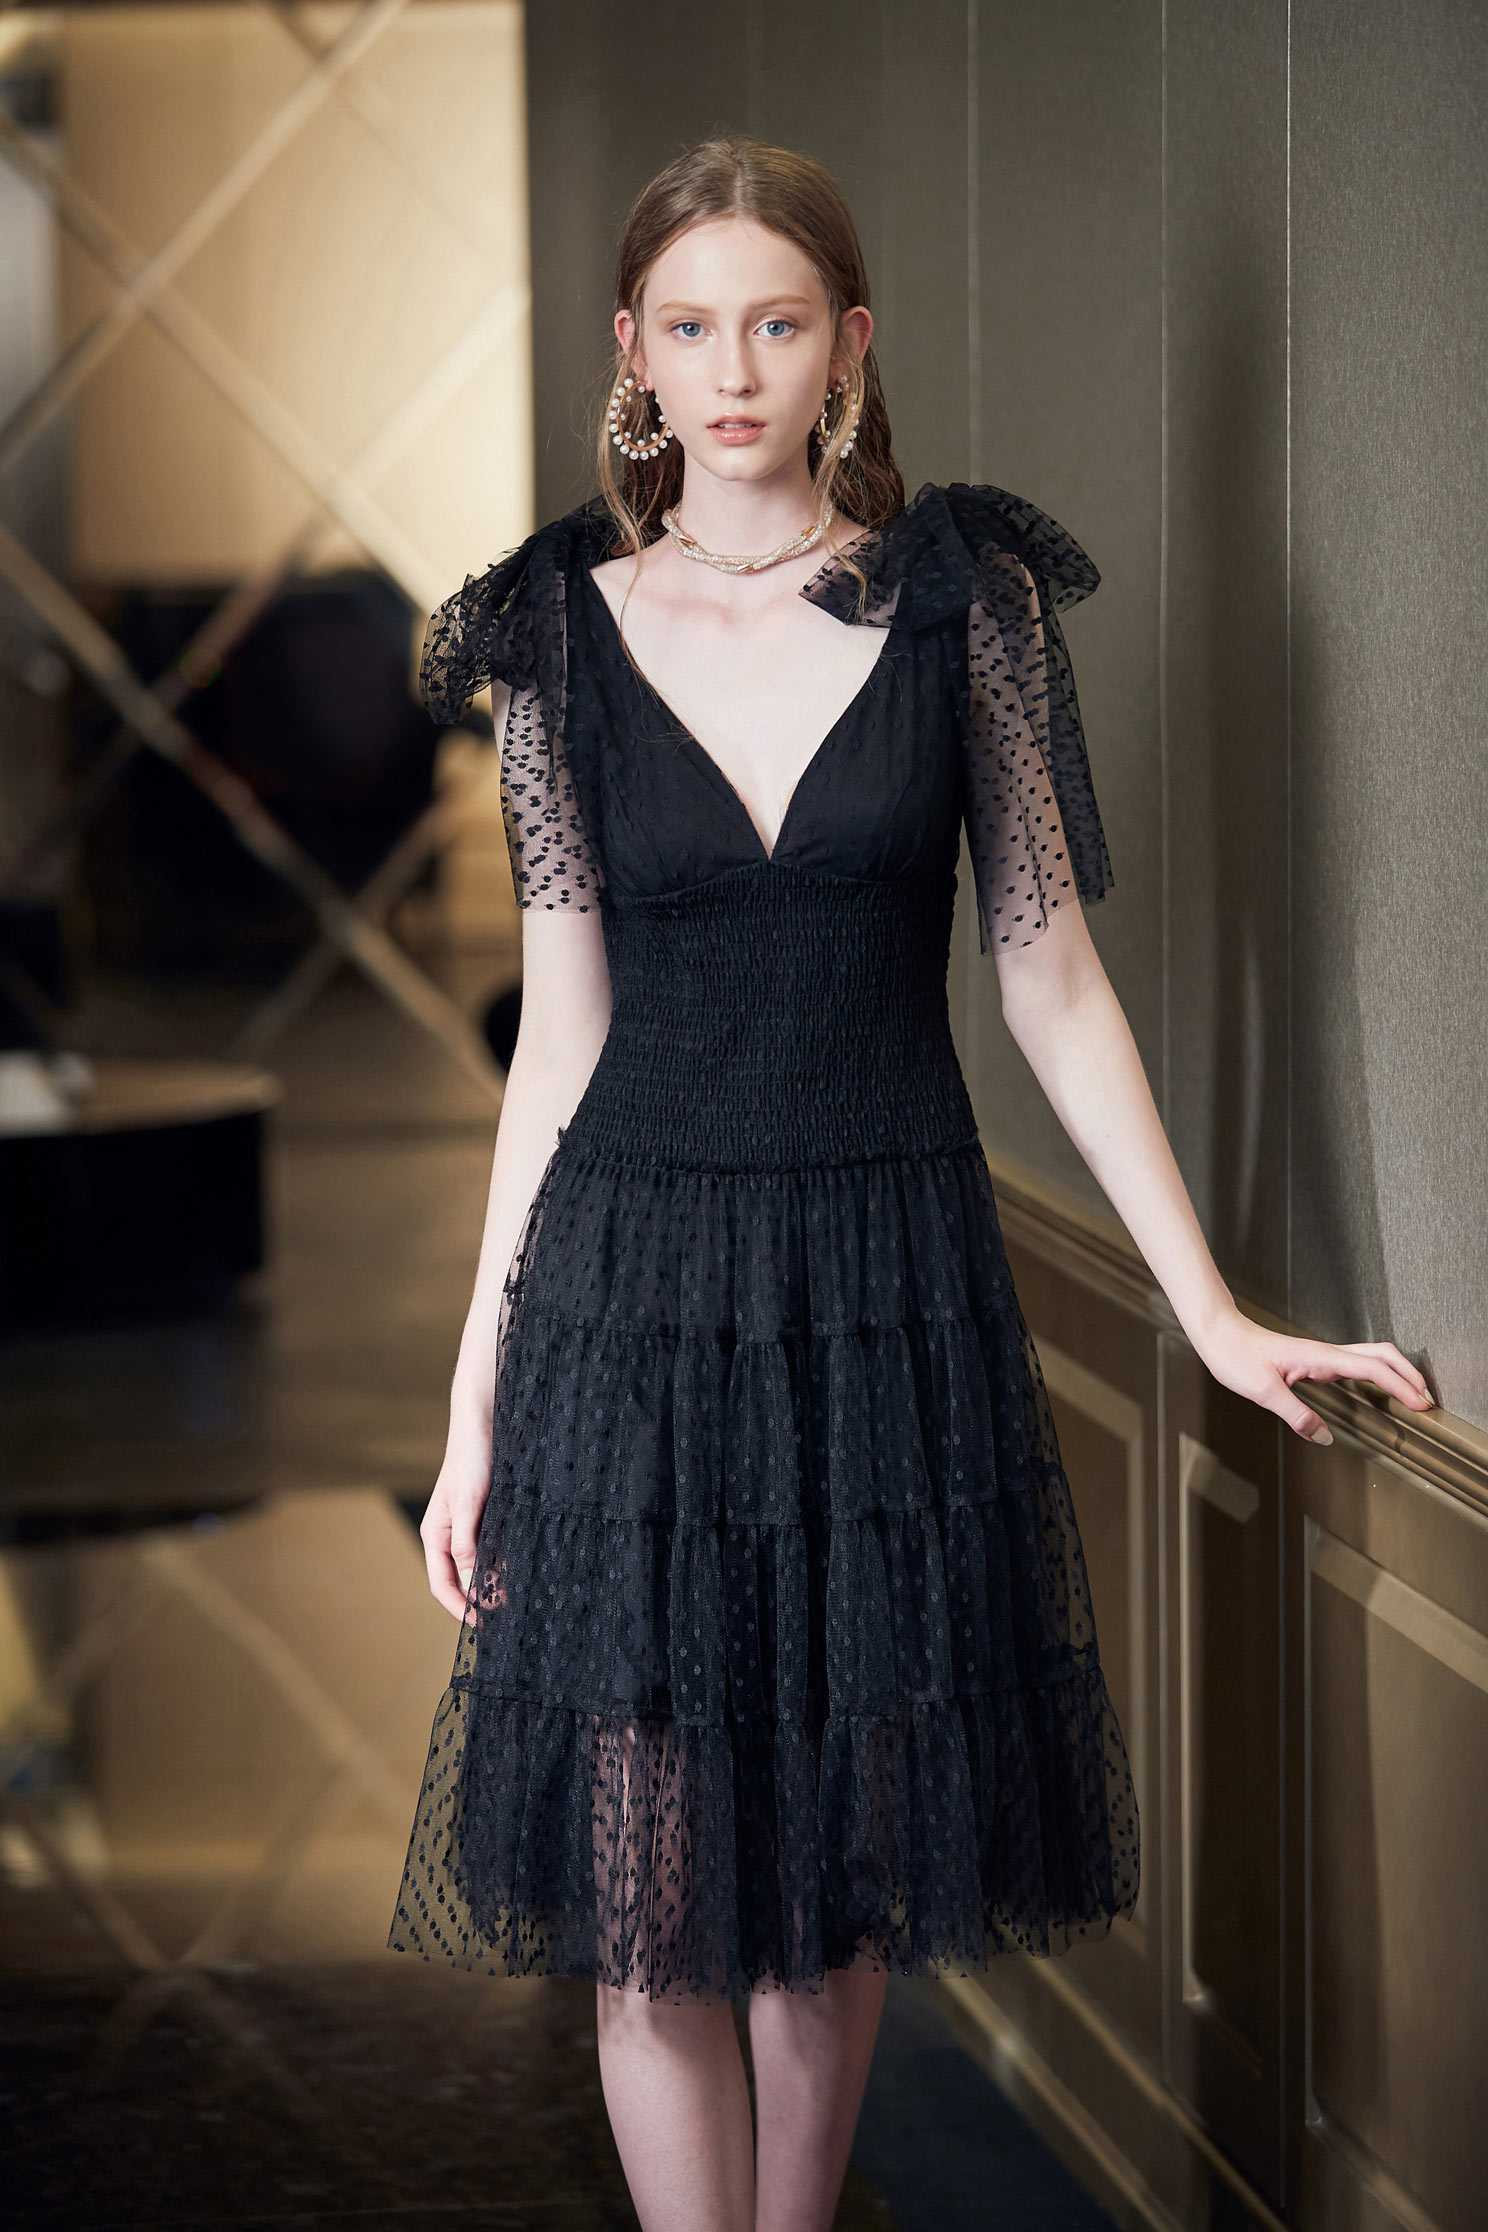 Retro and gorgeous dress,V-neck dress,Cocktail Dress,無袖洋裝,Evening Wear,Black dress